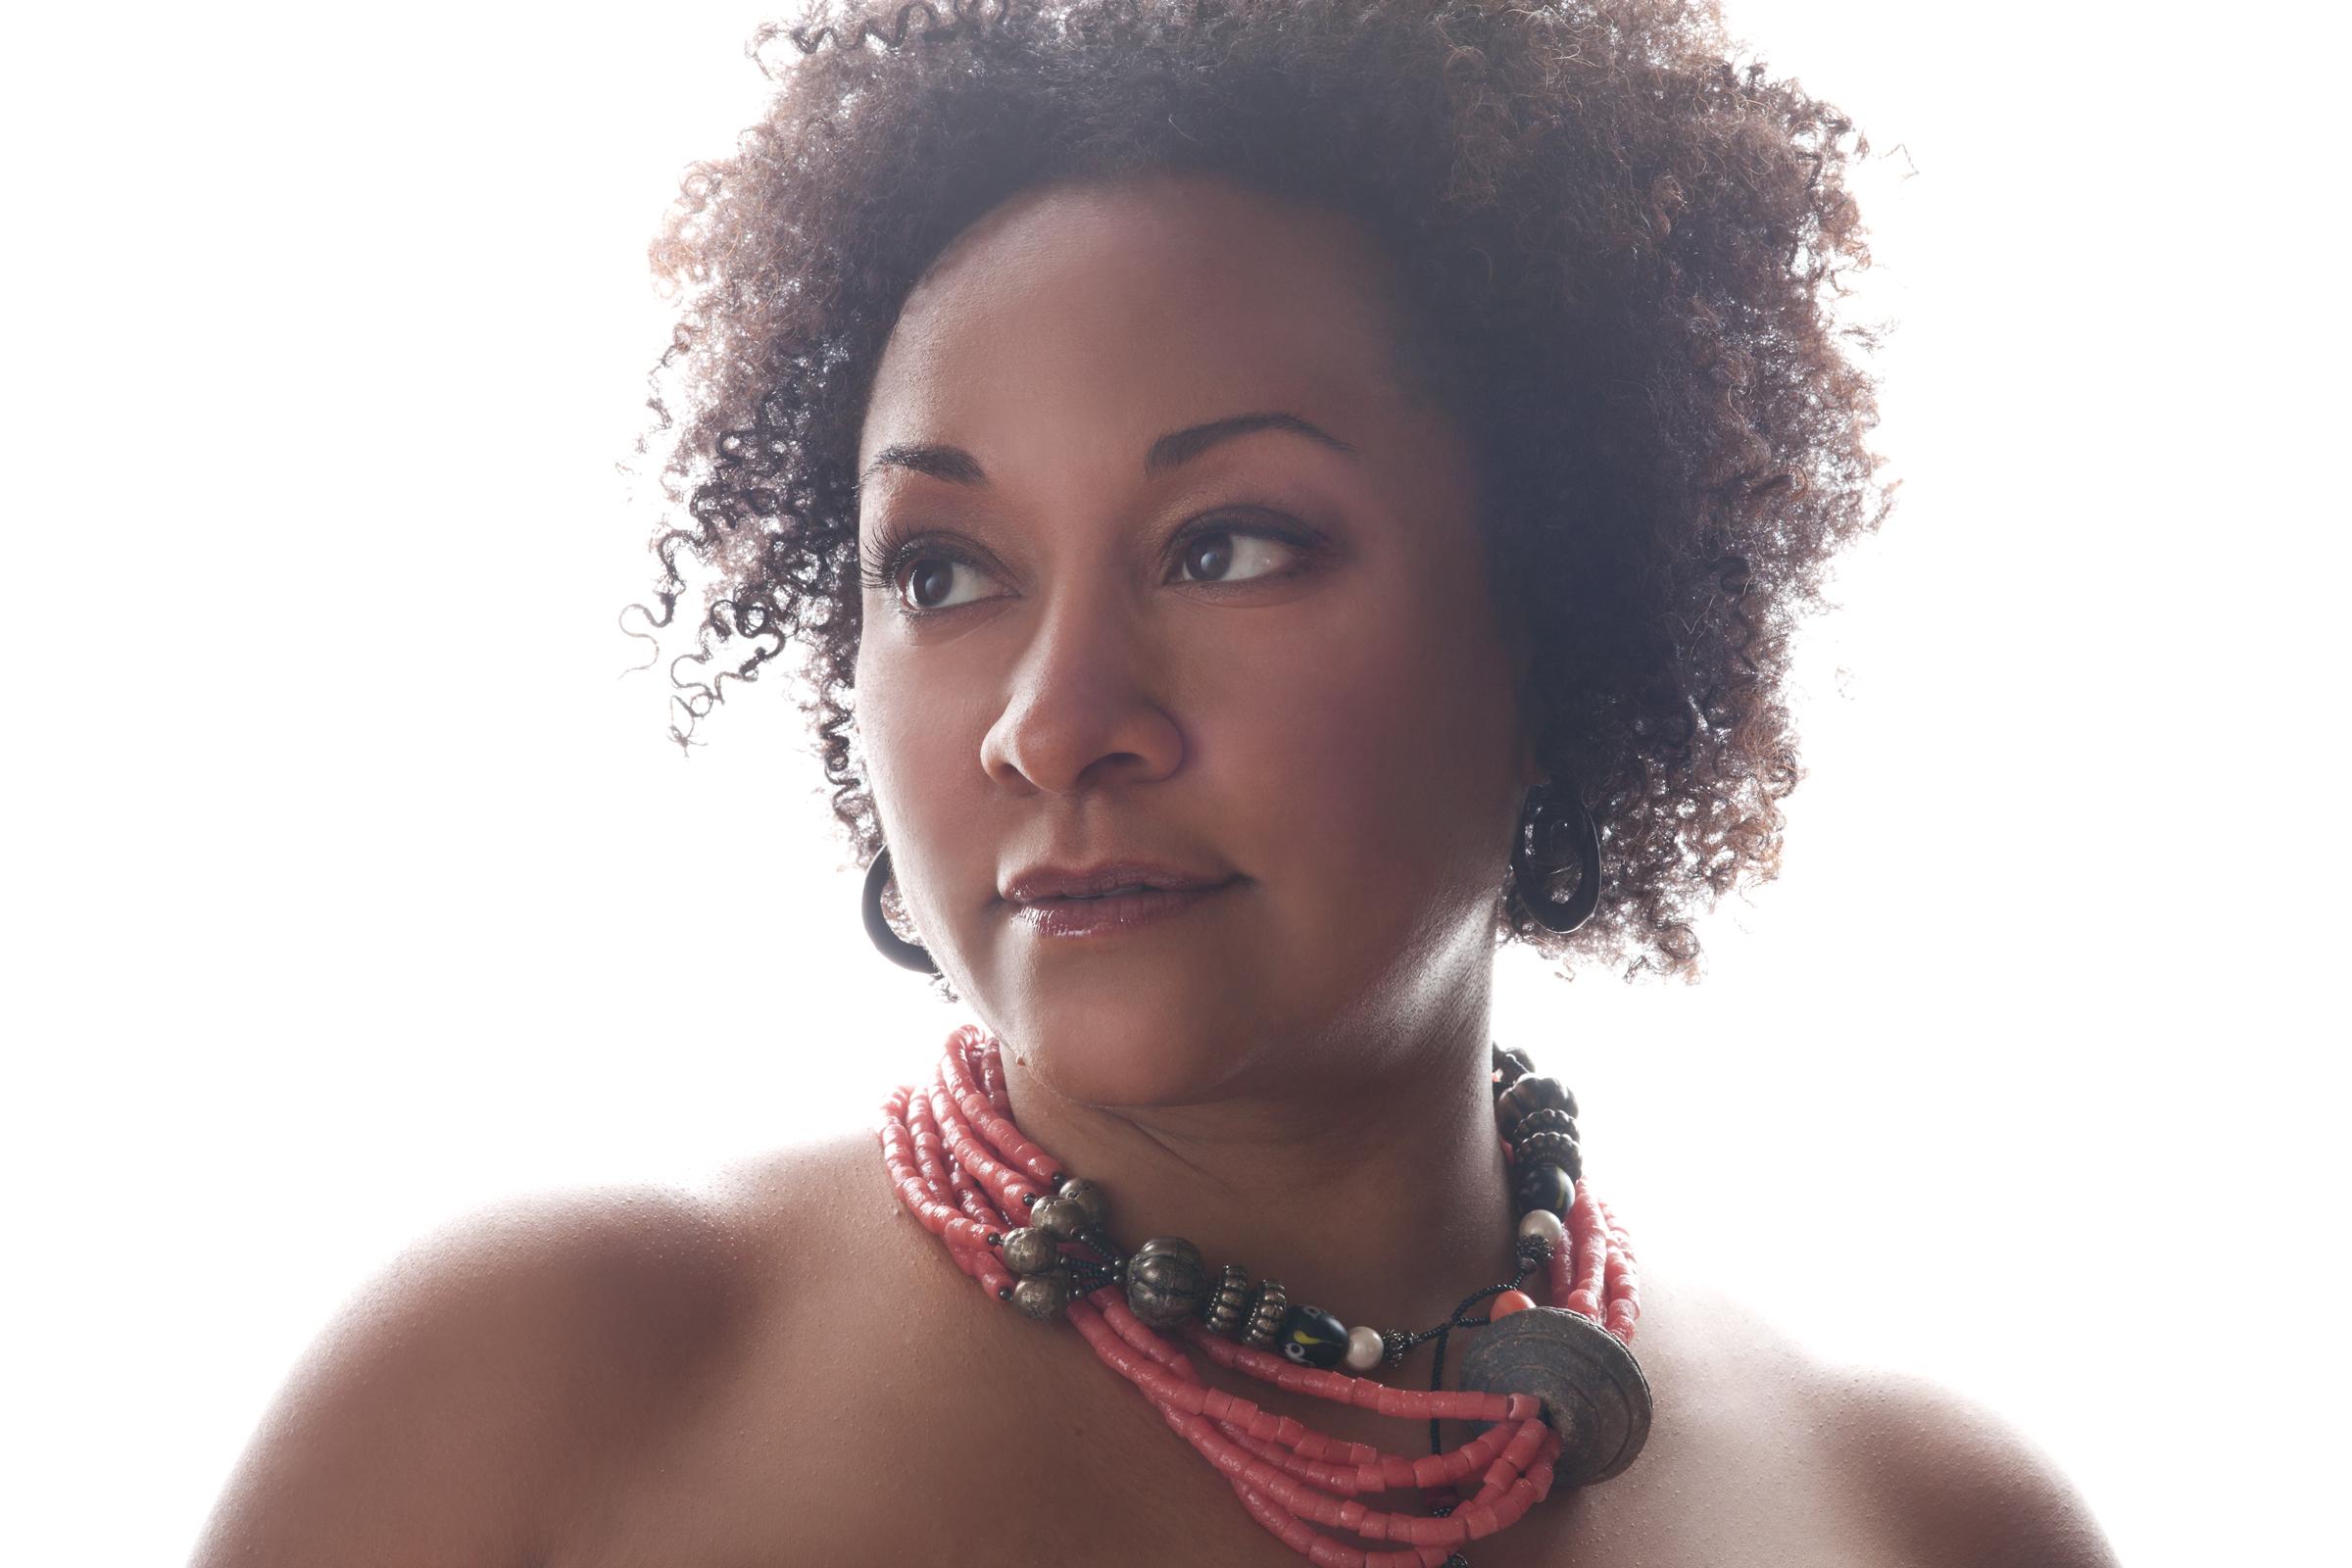 Karisa Wilson plays GRPL's Music in the Stacks concert series.